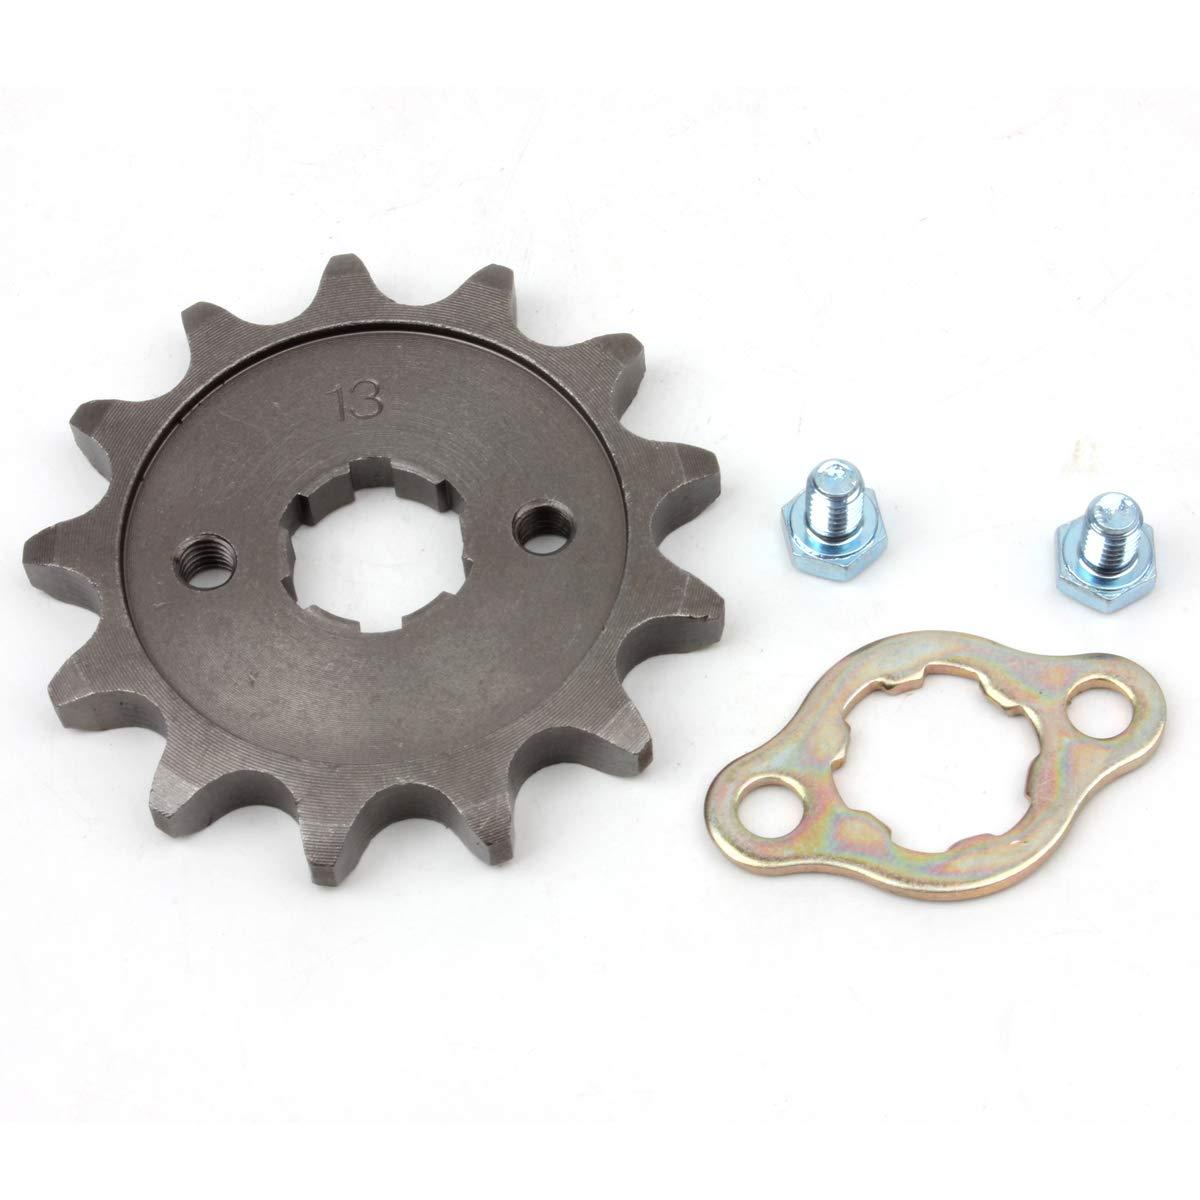 PRO CAKEN 530 13T Front Sprocket with Retainer Plate for Dirt Pit Bike ATV Go-kart DirtBikeClub 5559104566